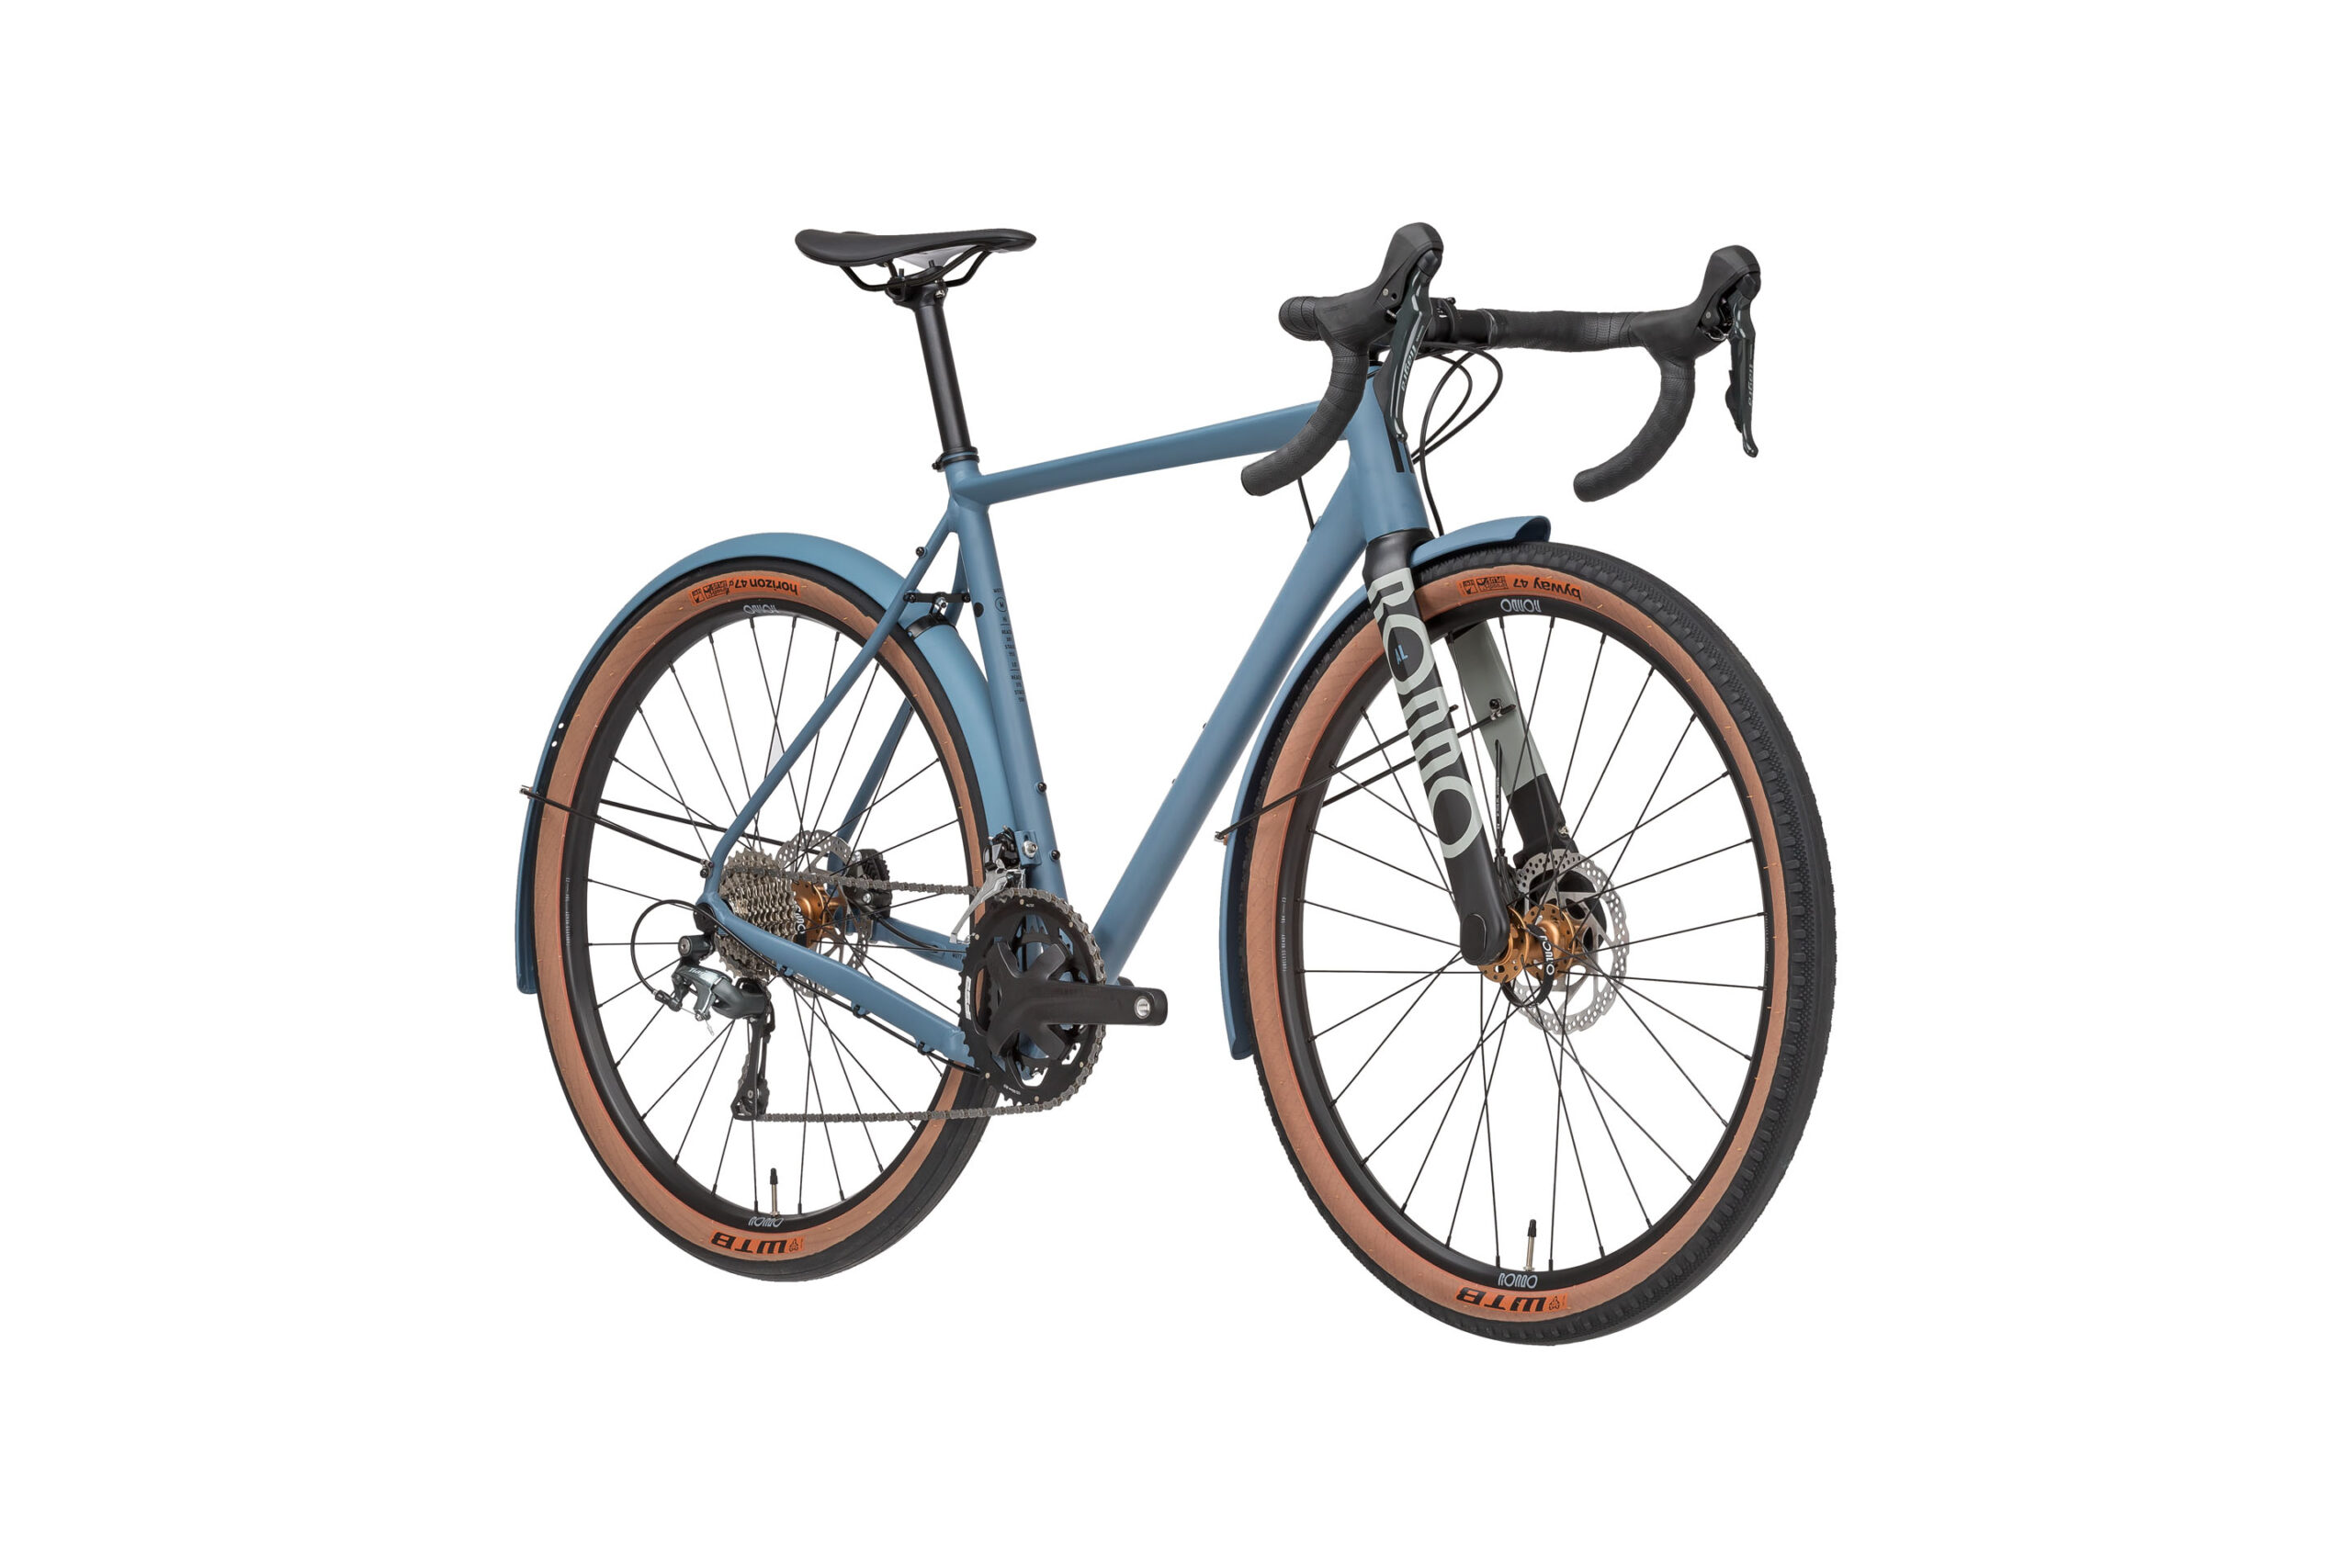 The versatile designs of Rondo's bikes